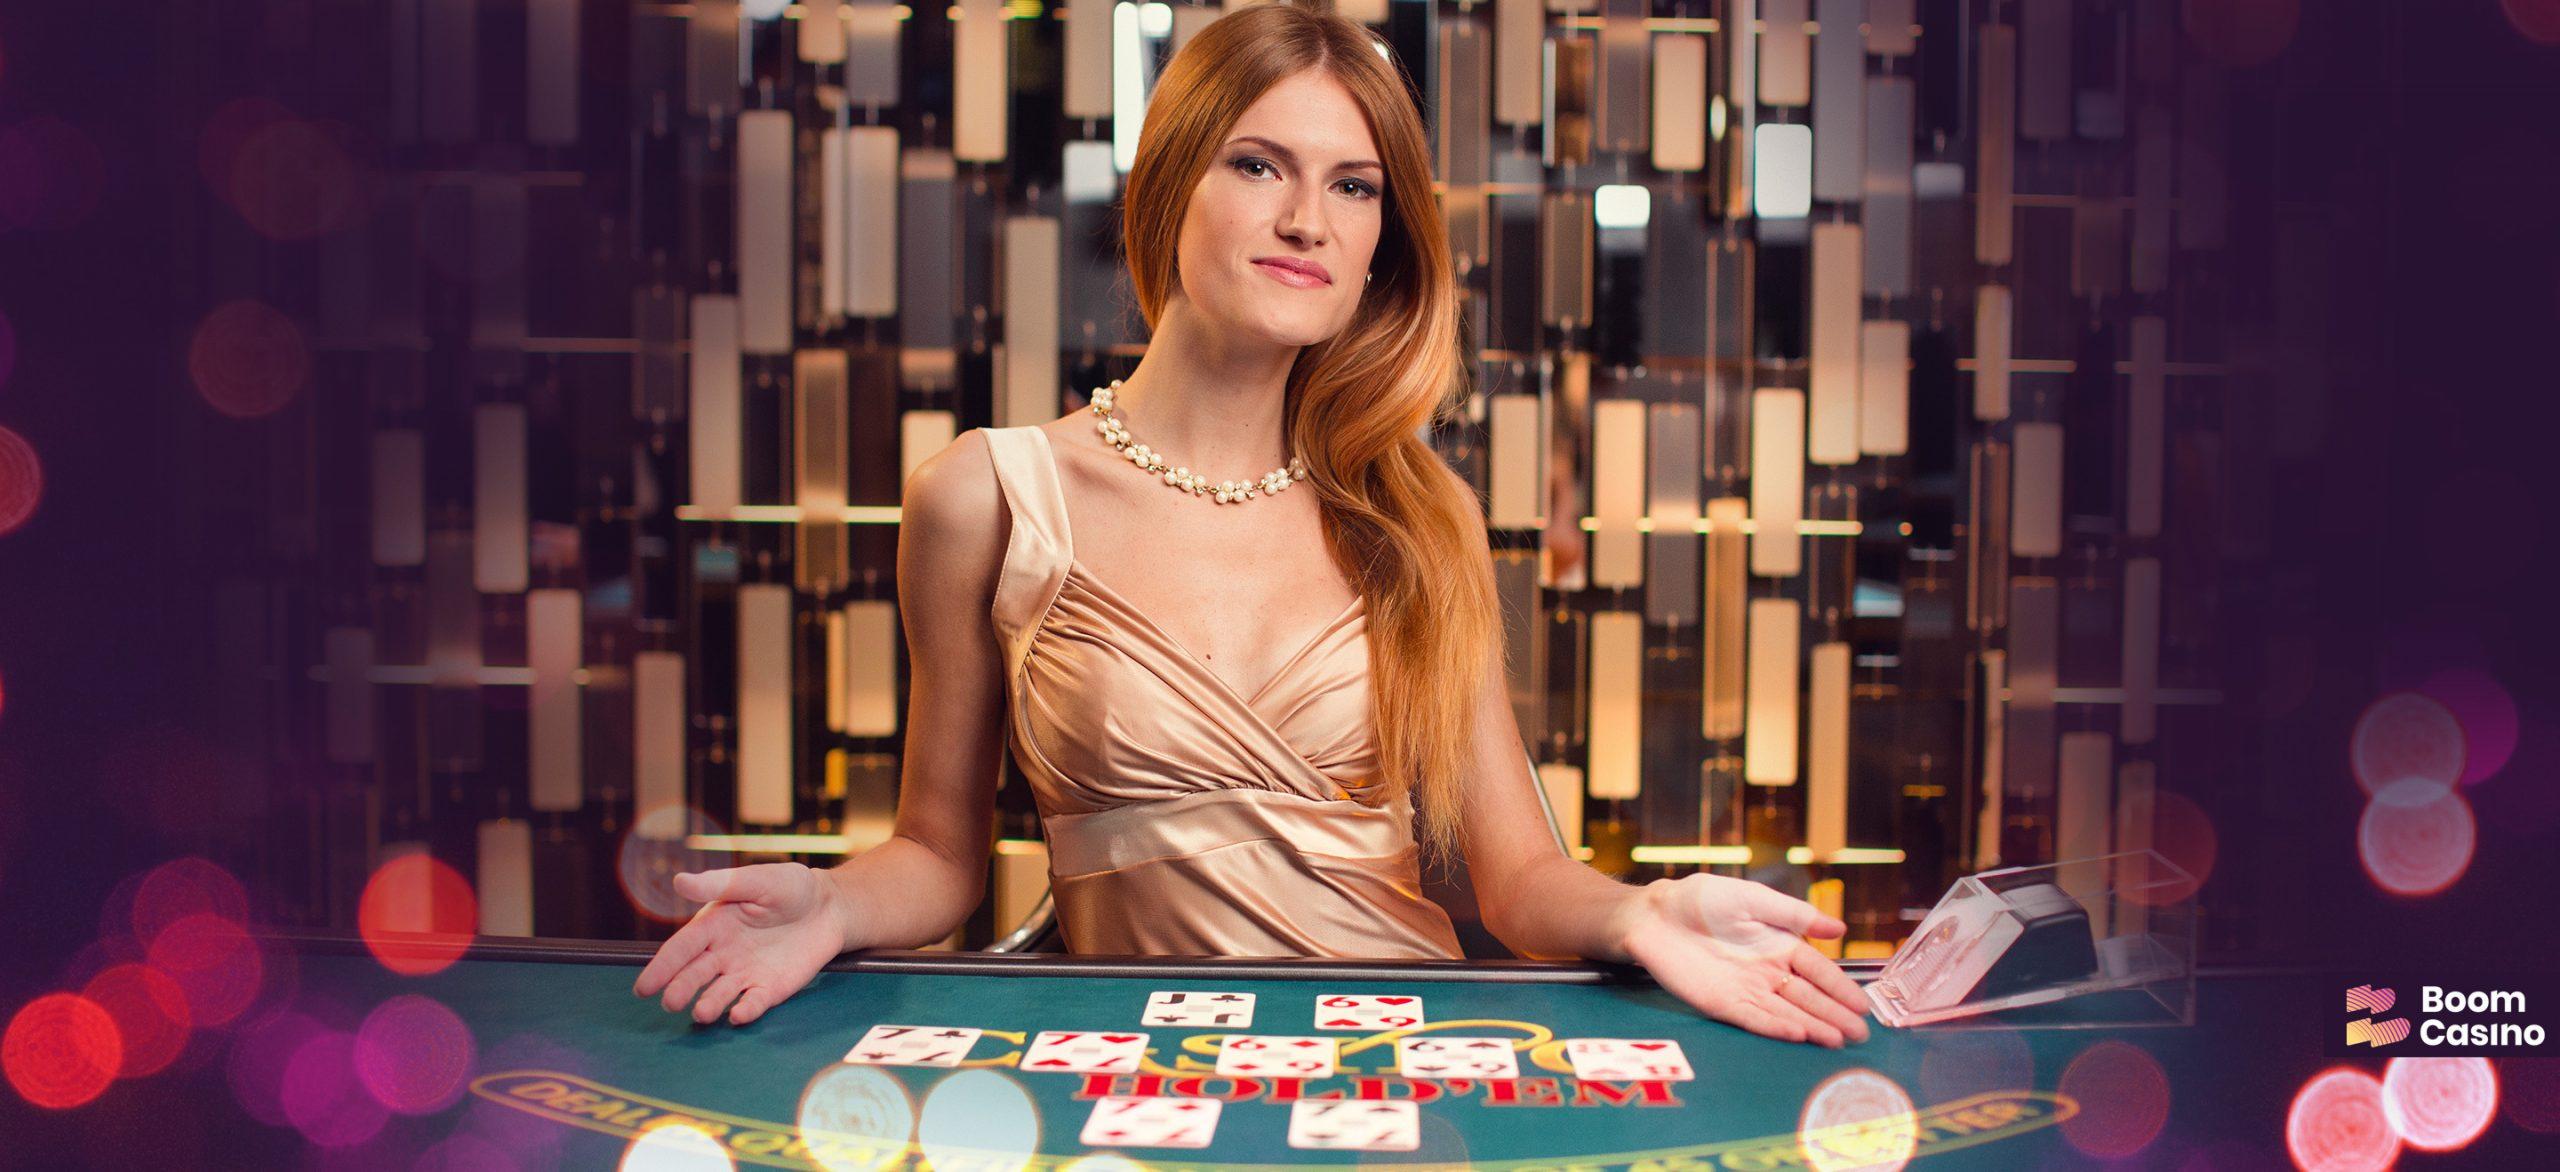 Casino Holdem Tipps